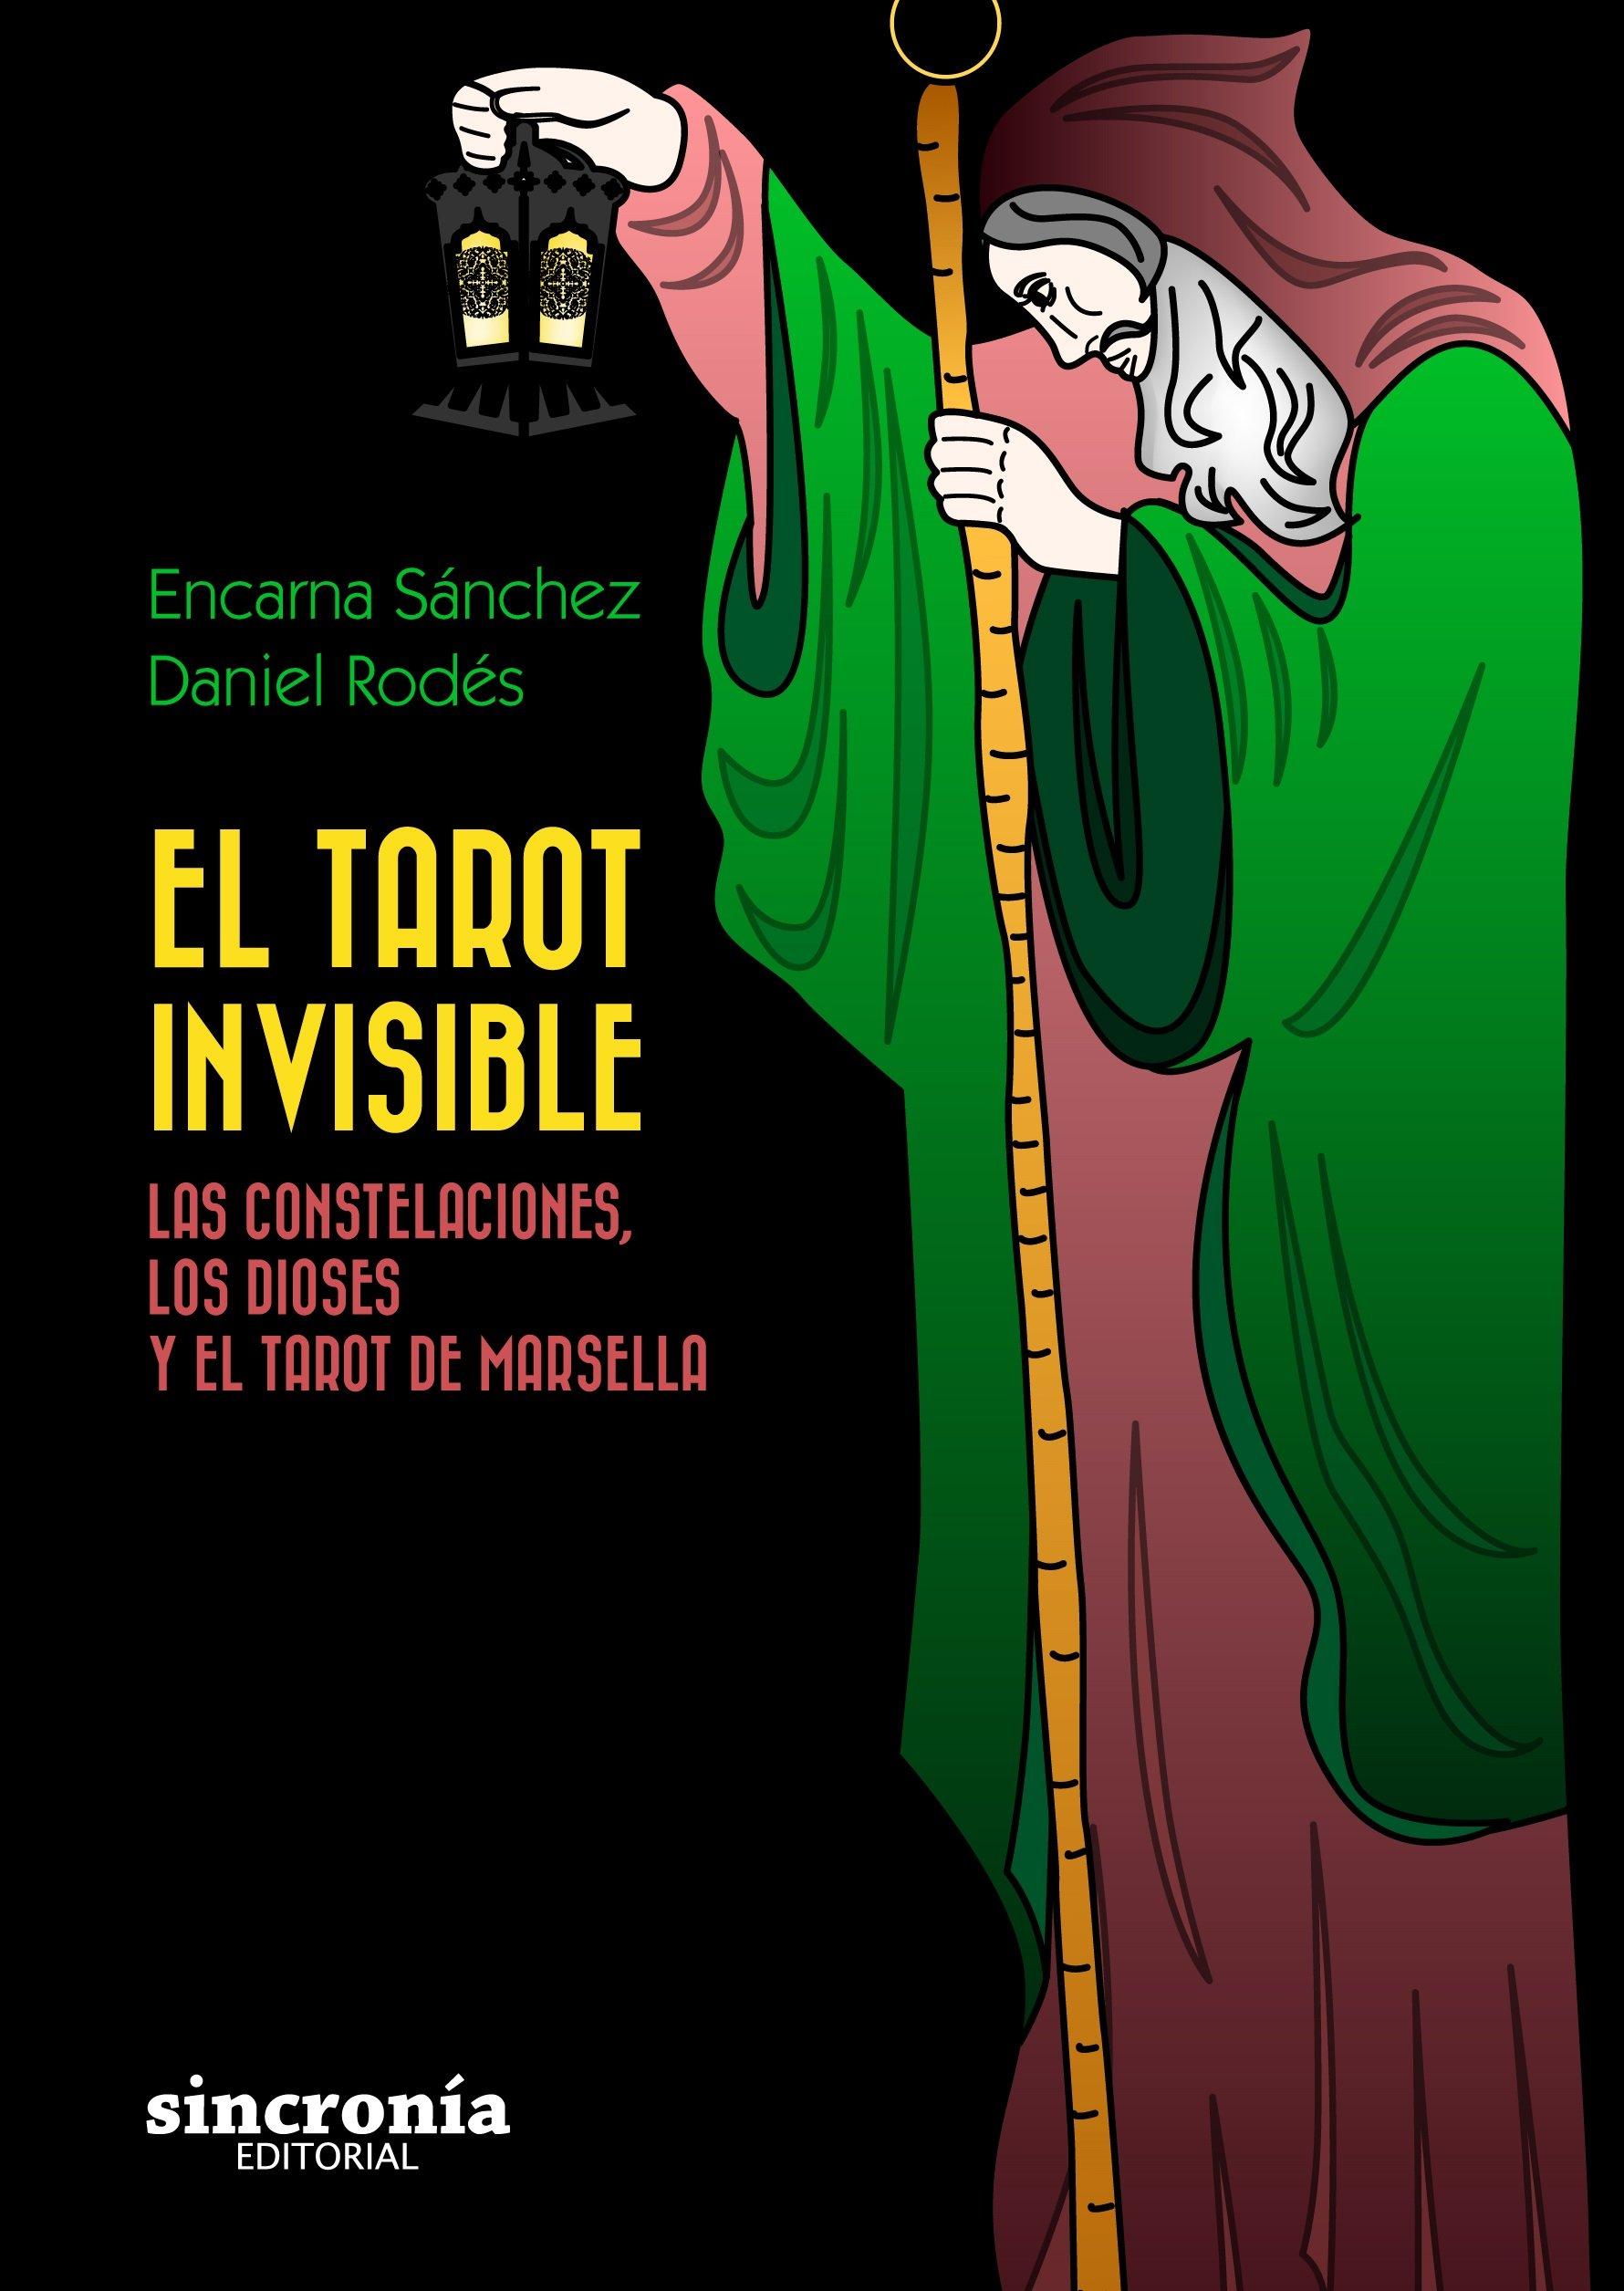 El tarot invisible: Amazon.es: Encarna Sánchez Giménez ...